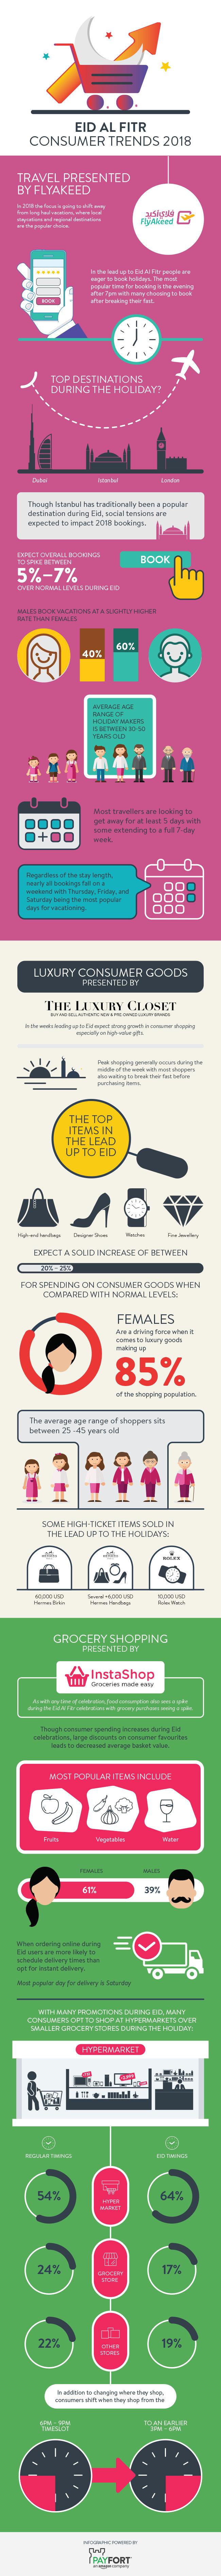 Eid Al Fitr consumer trends 2018 #Infographic